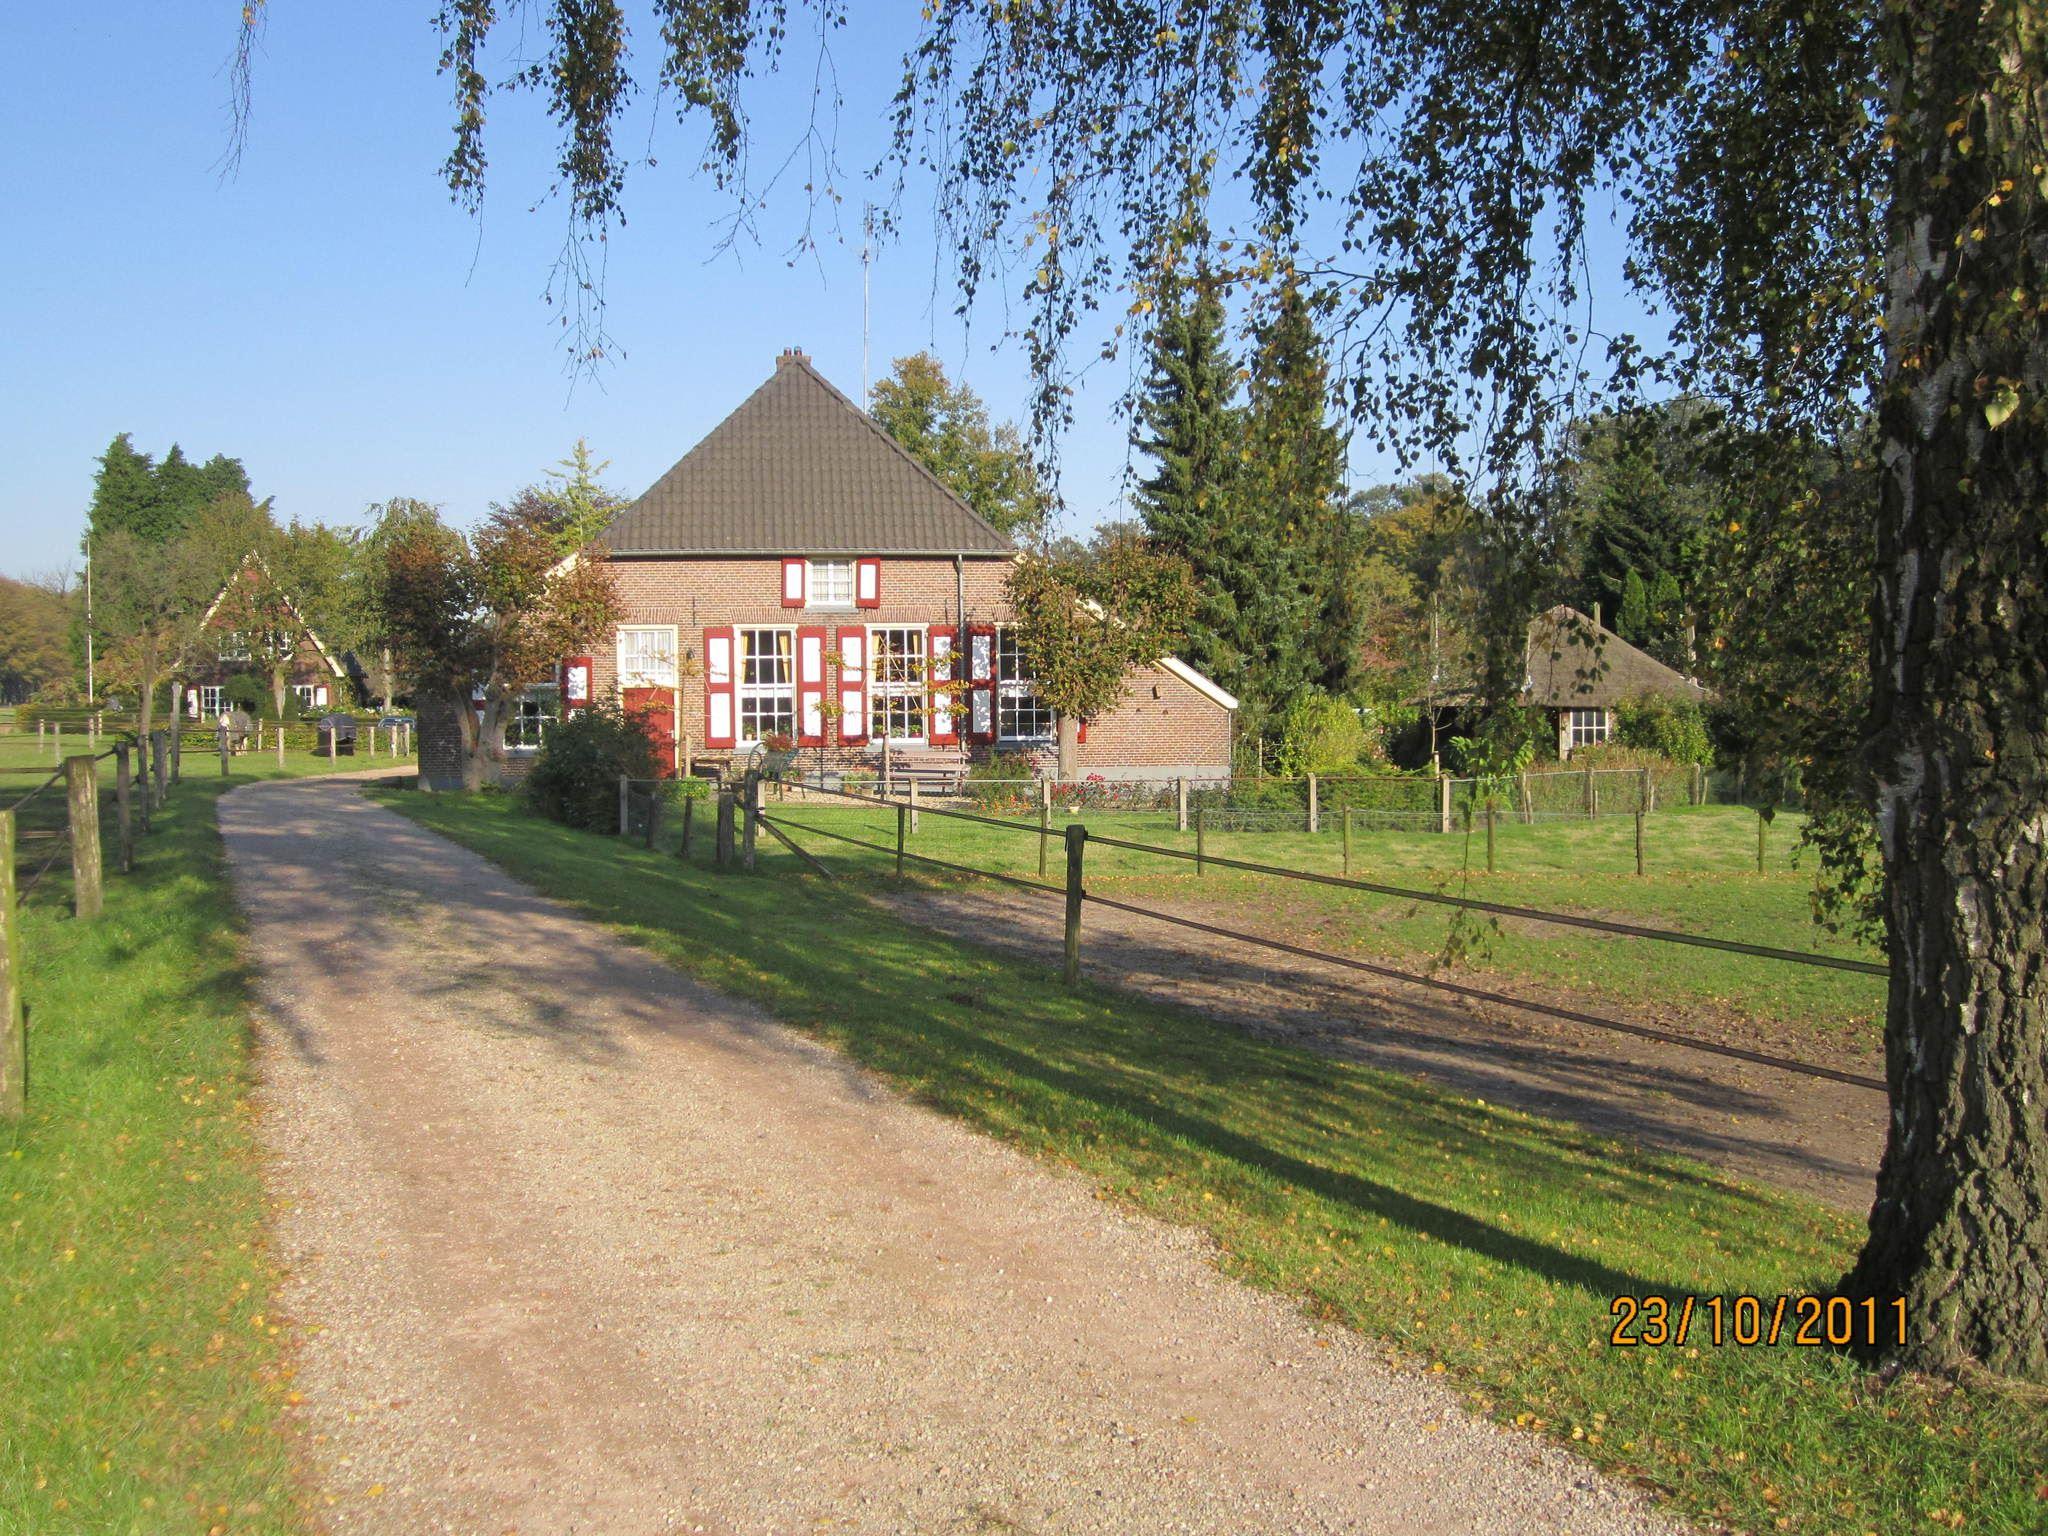 Huis te koop landgoed middachten 6994 jc de steeg funda for Funda landgoed